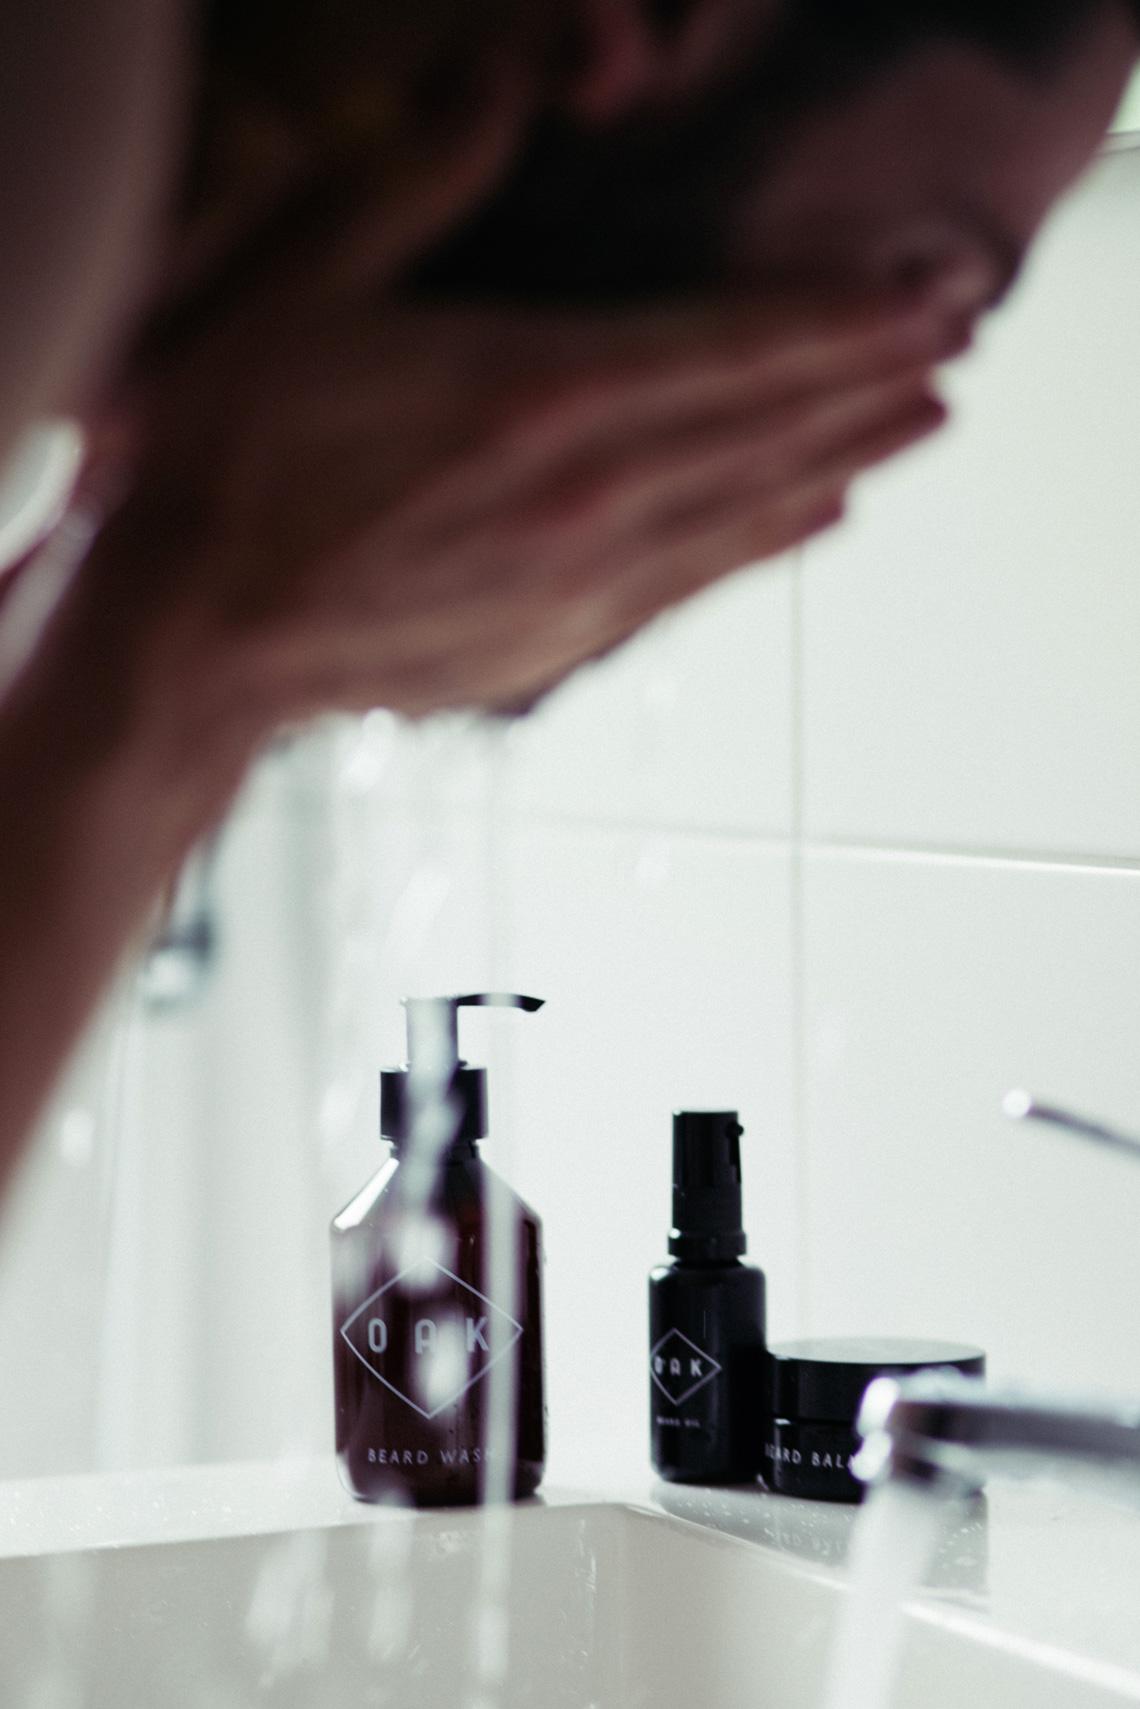 Kaisers-neue-Kleider-Oak-Beard-Care-Beauty-Bartpflege-Fashionblog-Grooming-Männermode-Malefashion